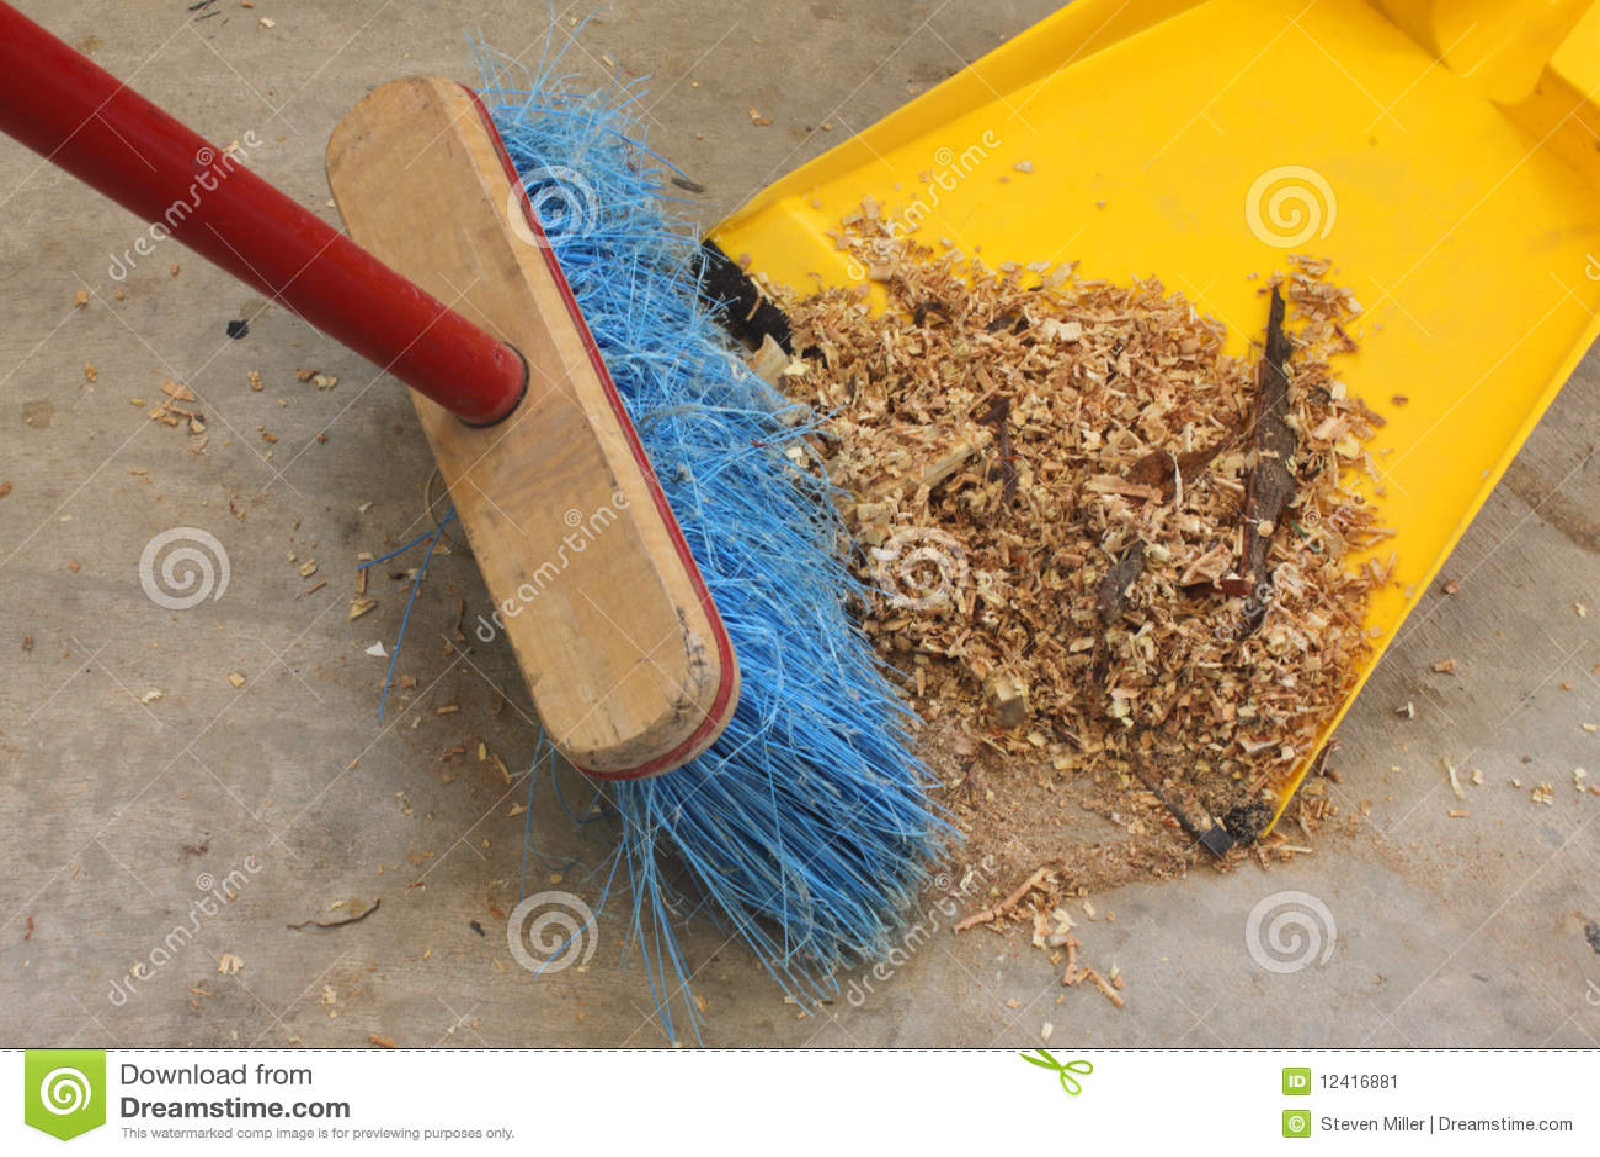 Sweeping Up Wood Shavings Stock Image Image Of Shavings